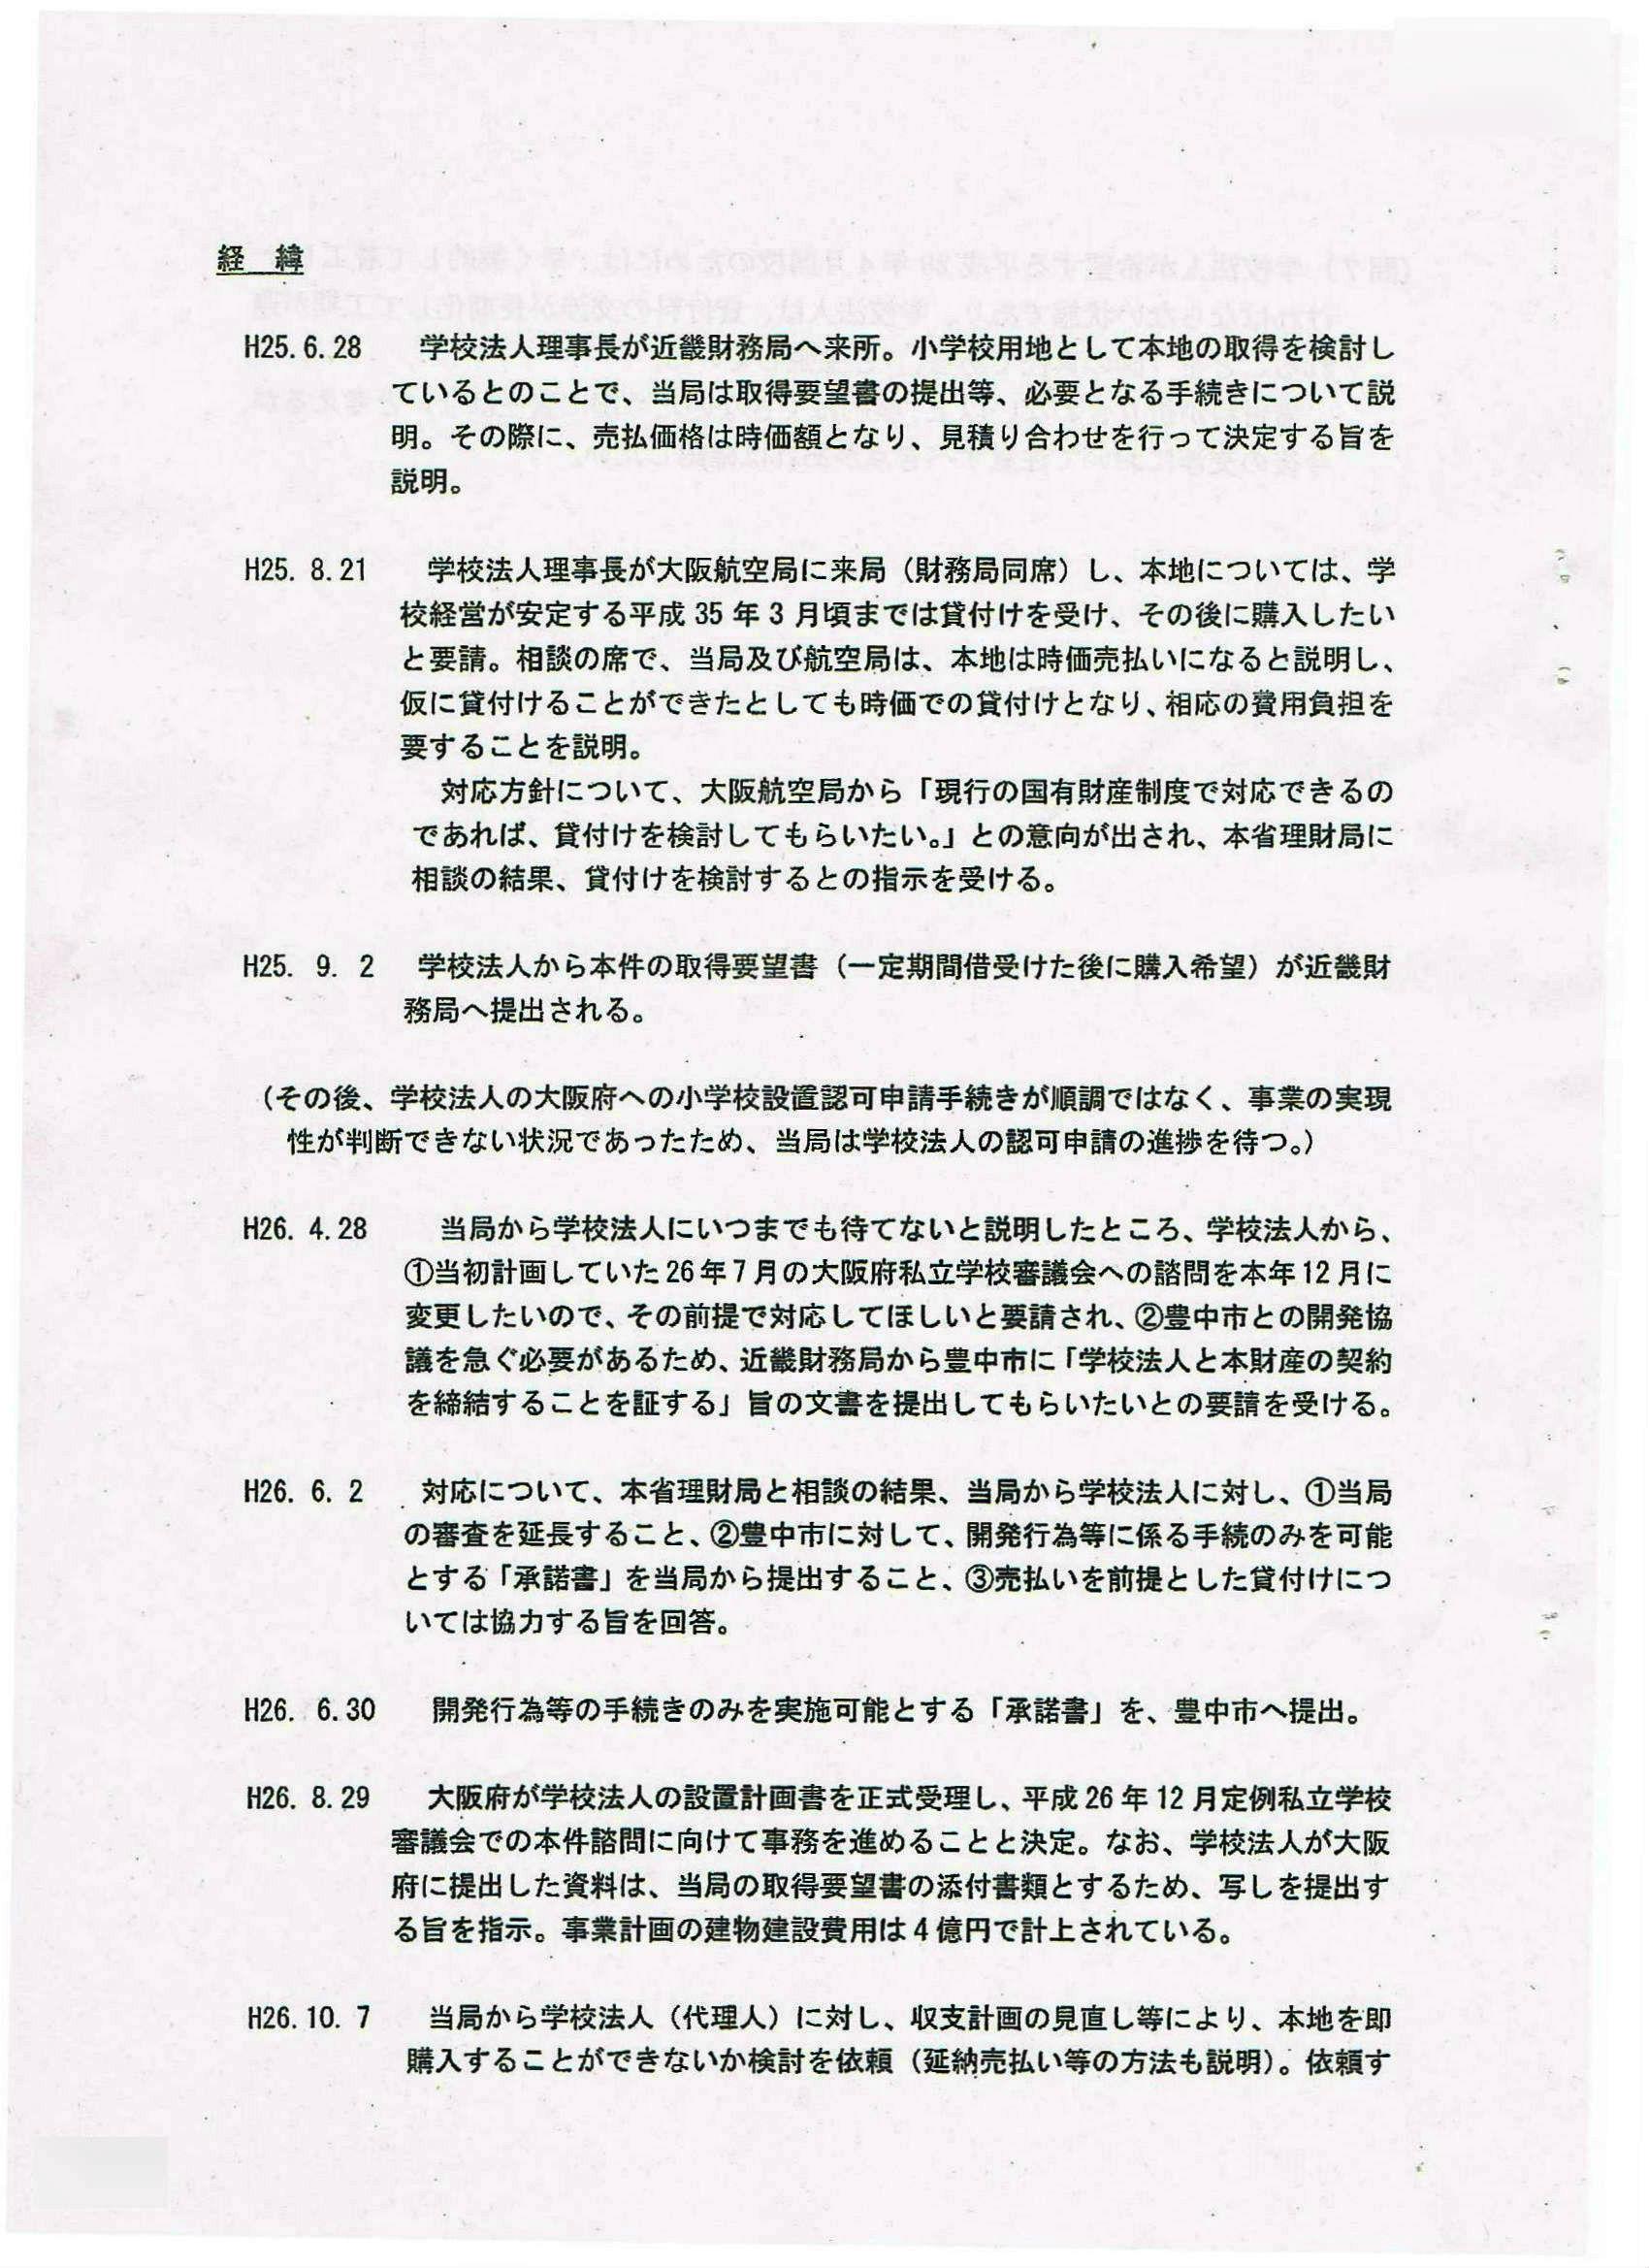 http://hunter-investigate.jp/news/1dd1c65ad80fc53543e690e7aa1663f2488987bd.jpg